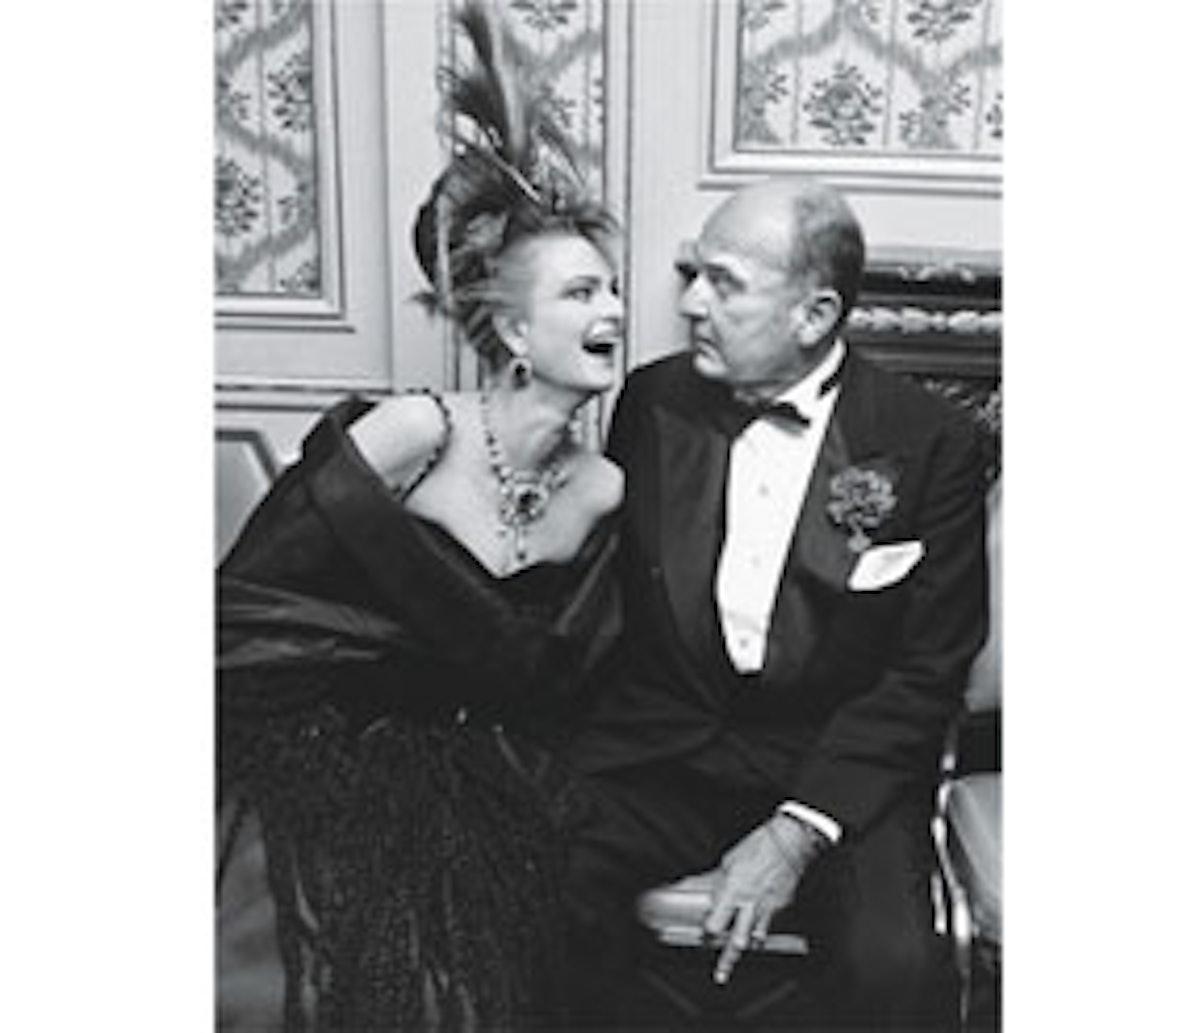 faar-fashion-scandals-40-years-11.jpg